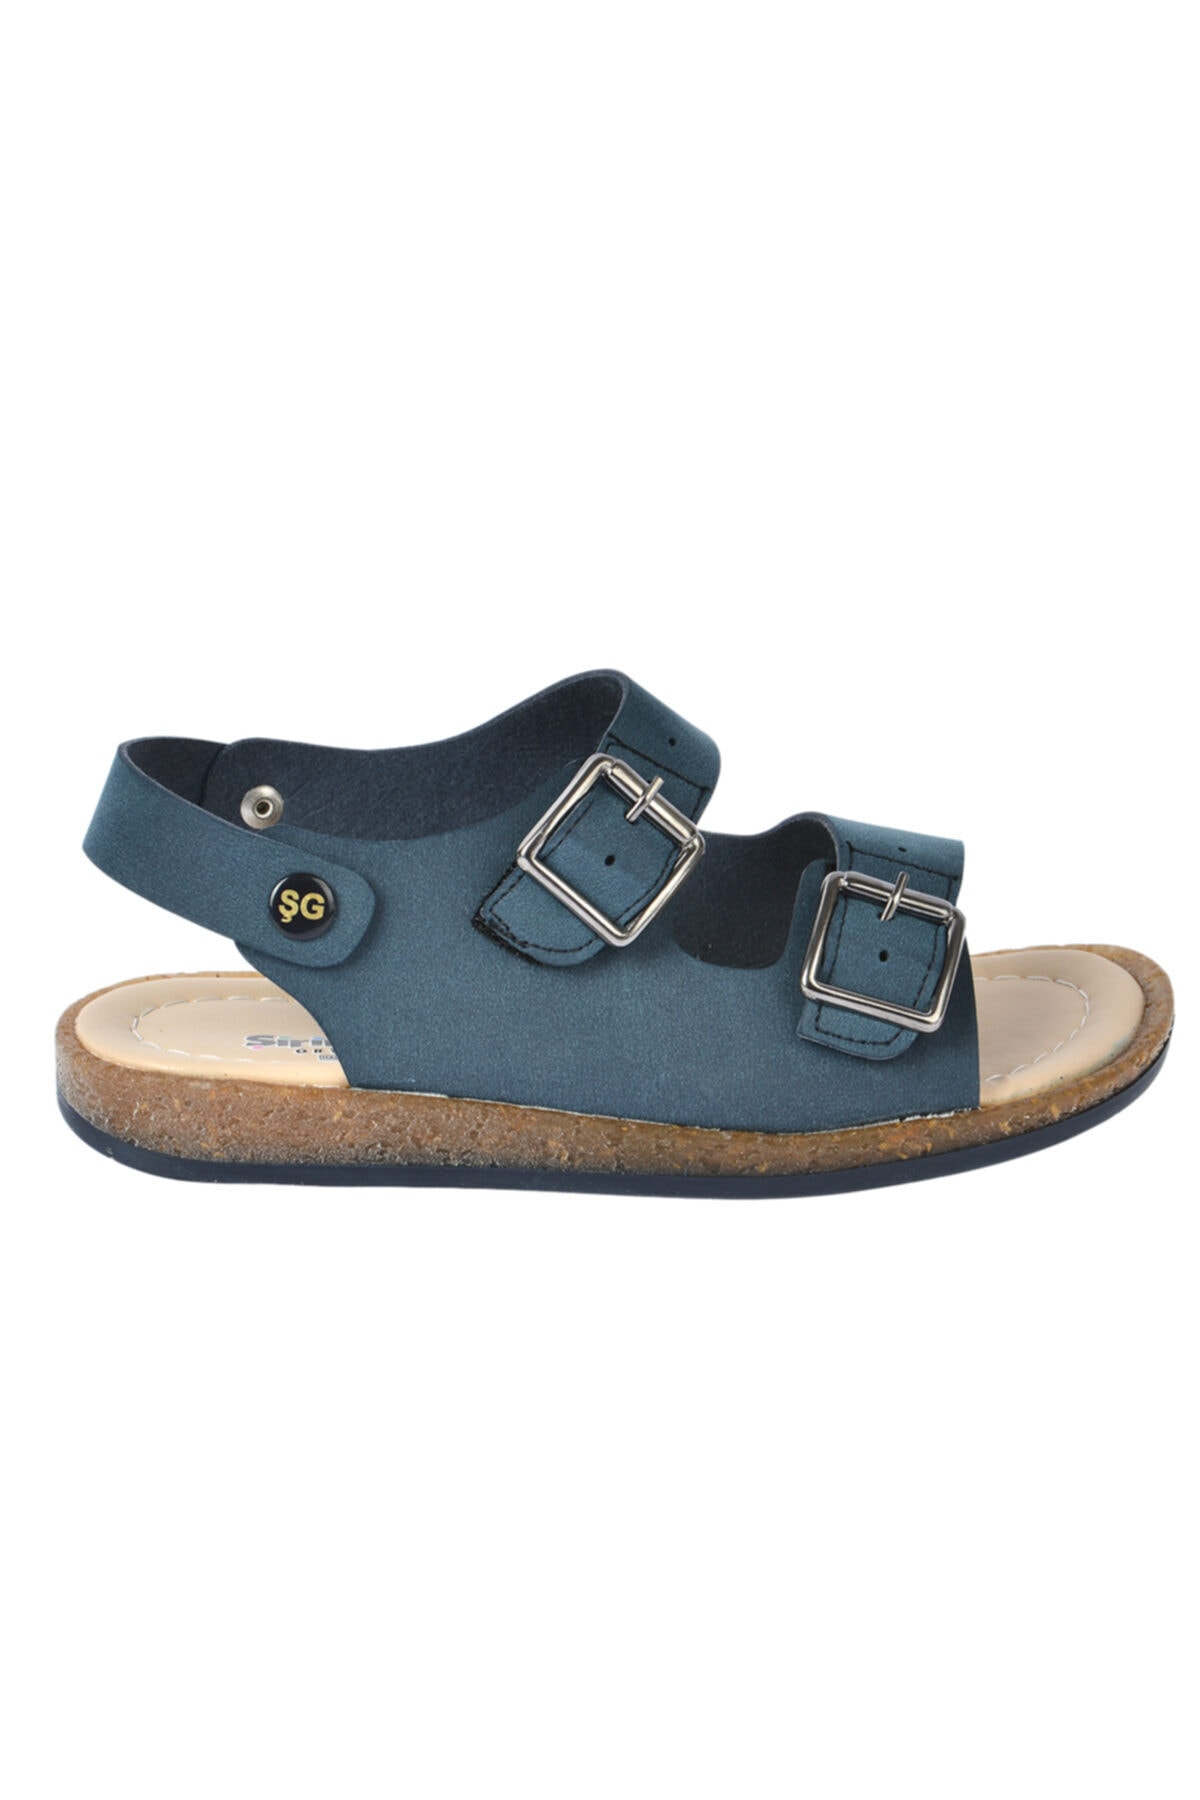 Erkek Çocuk Lacivert Sandalet Şb 2330-39